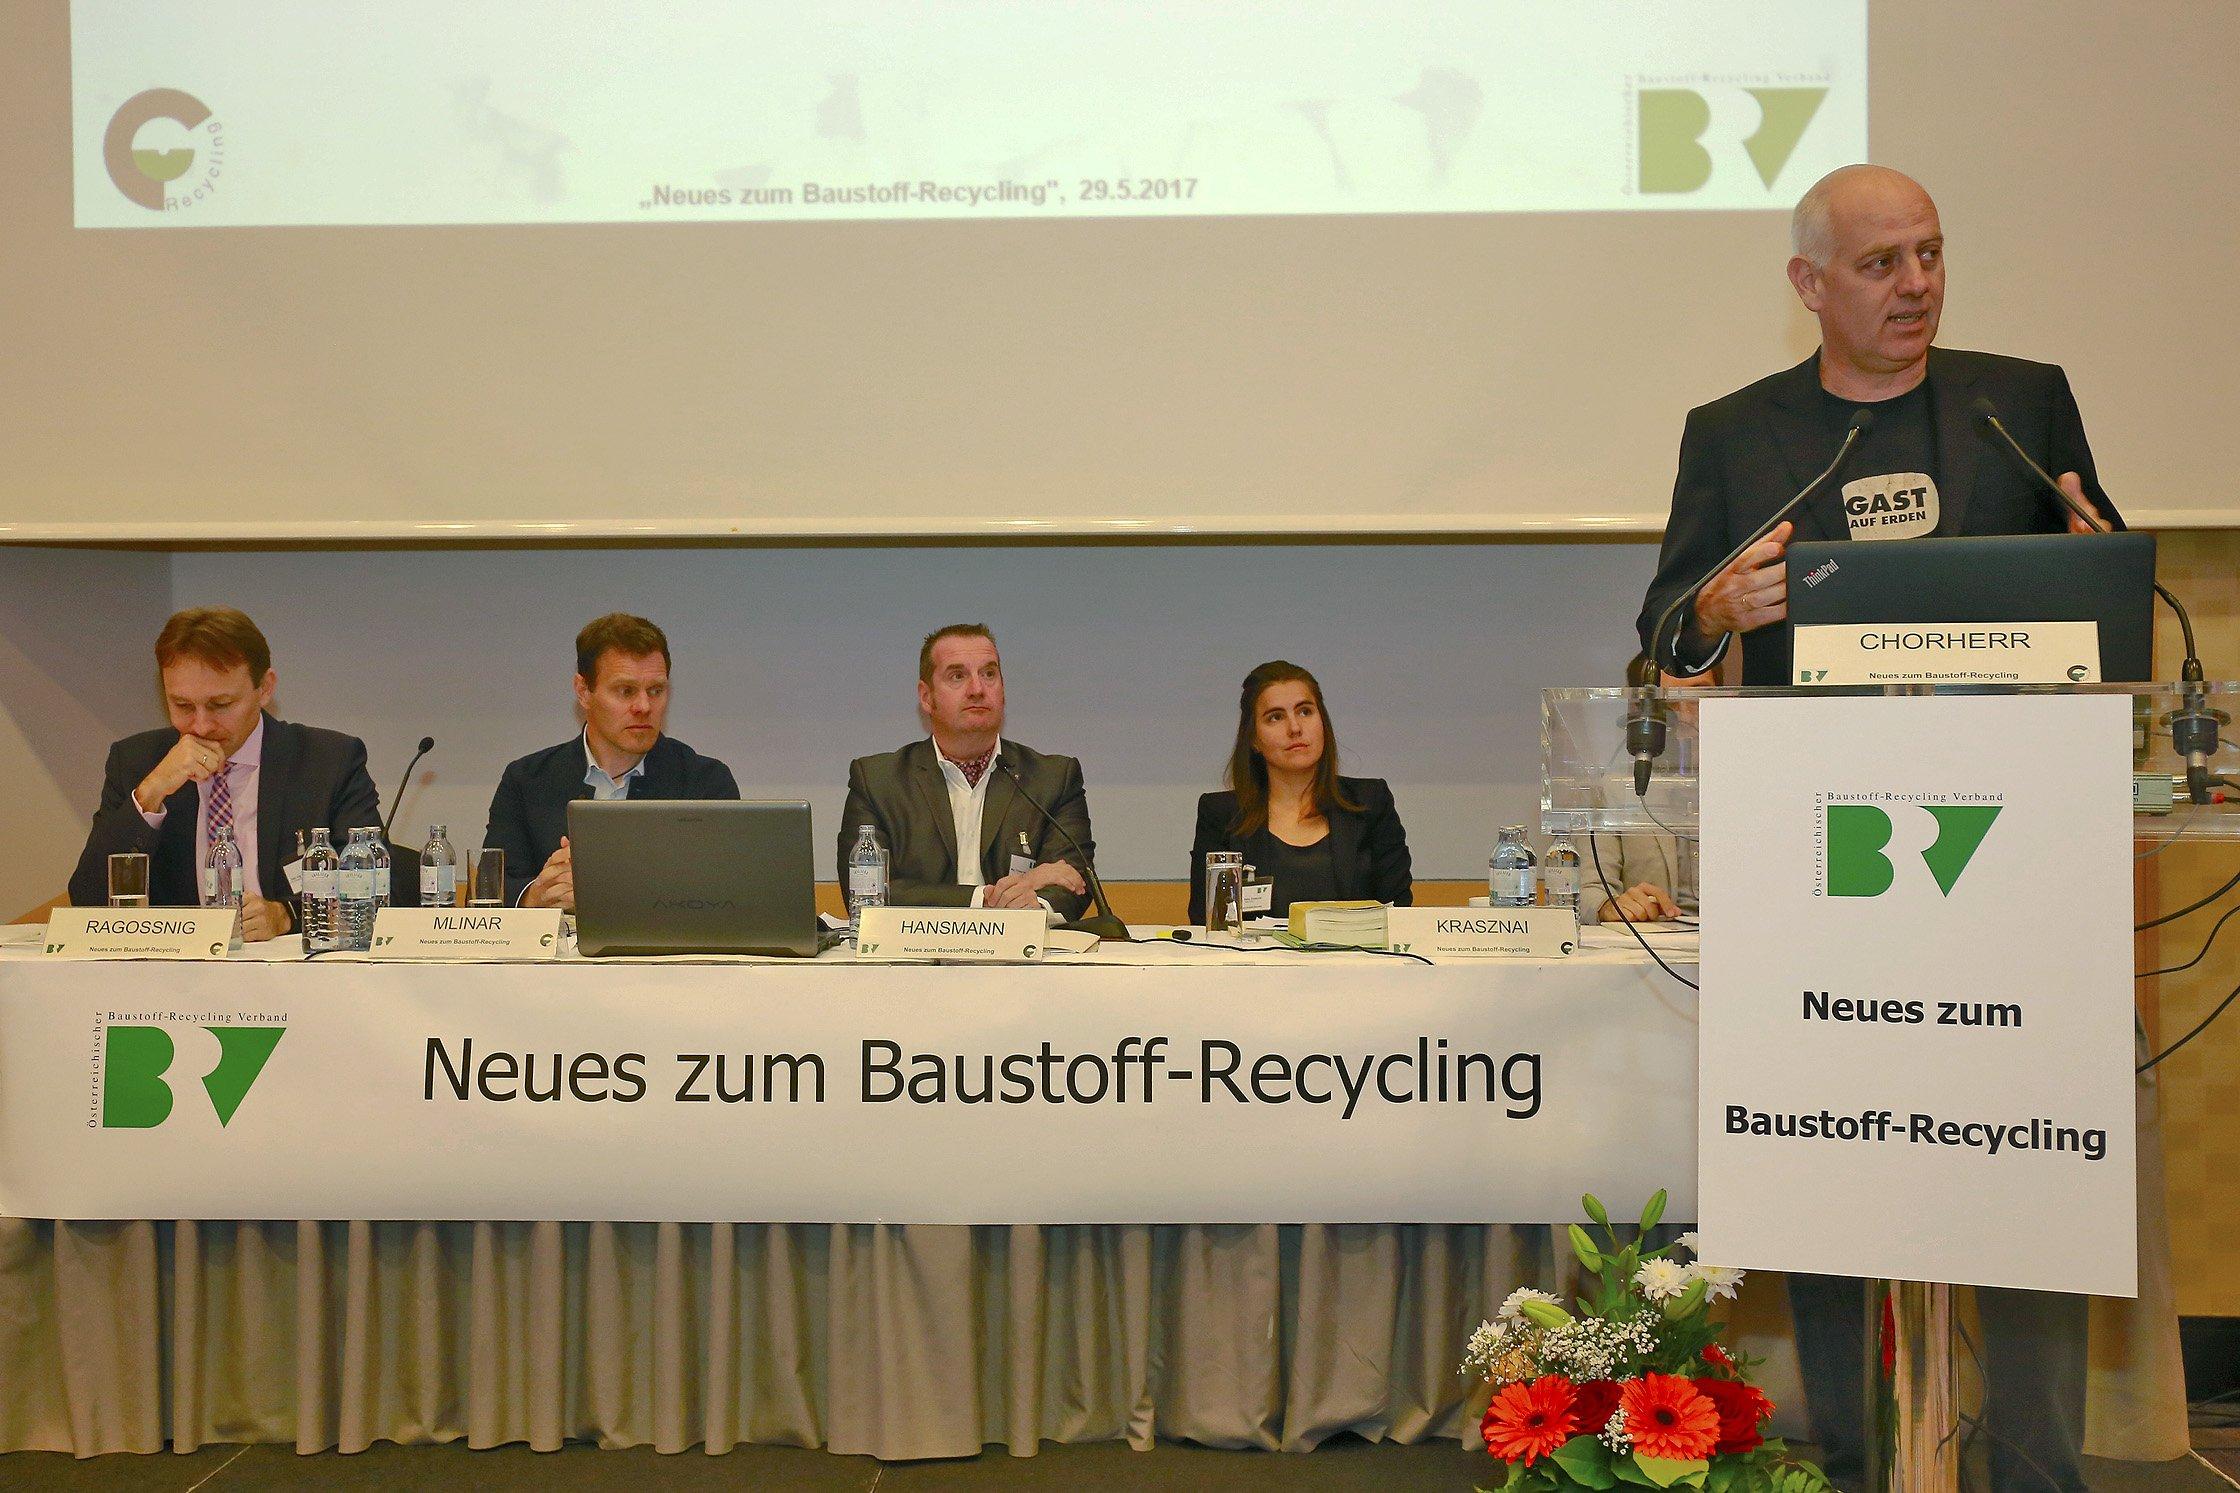 Baustoff-Recycling